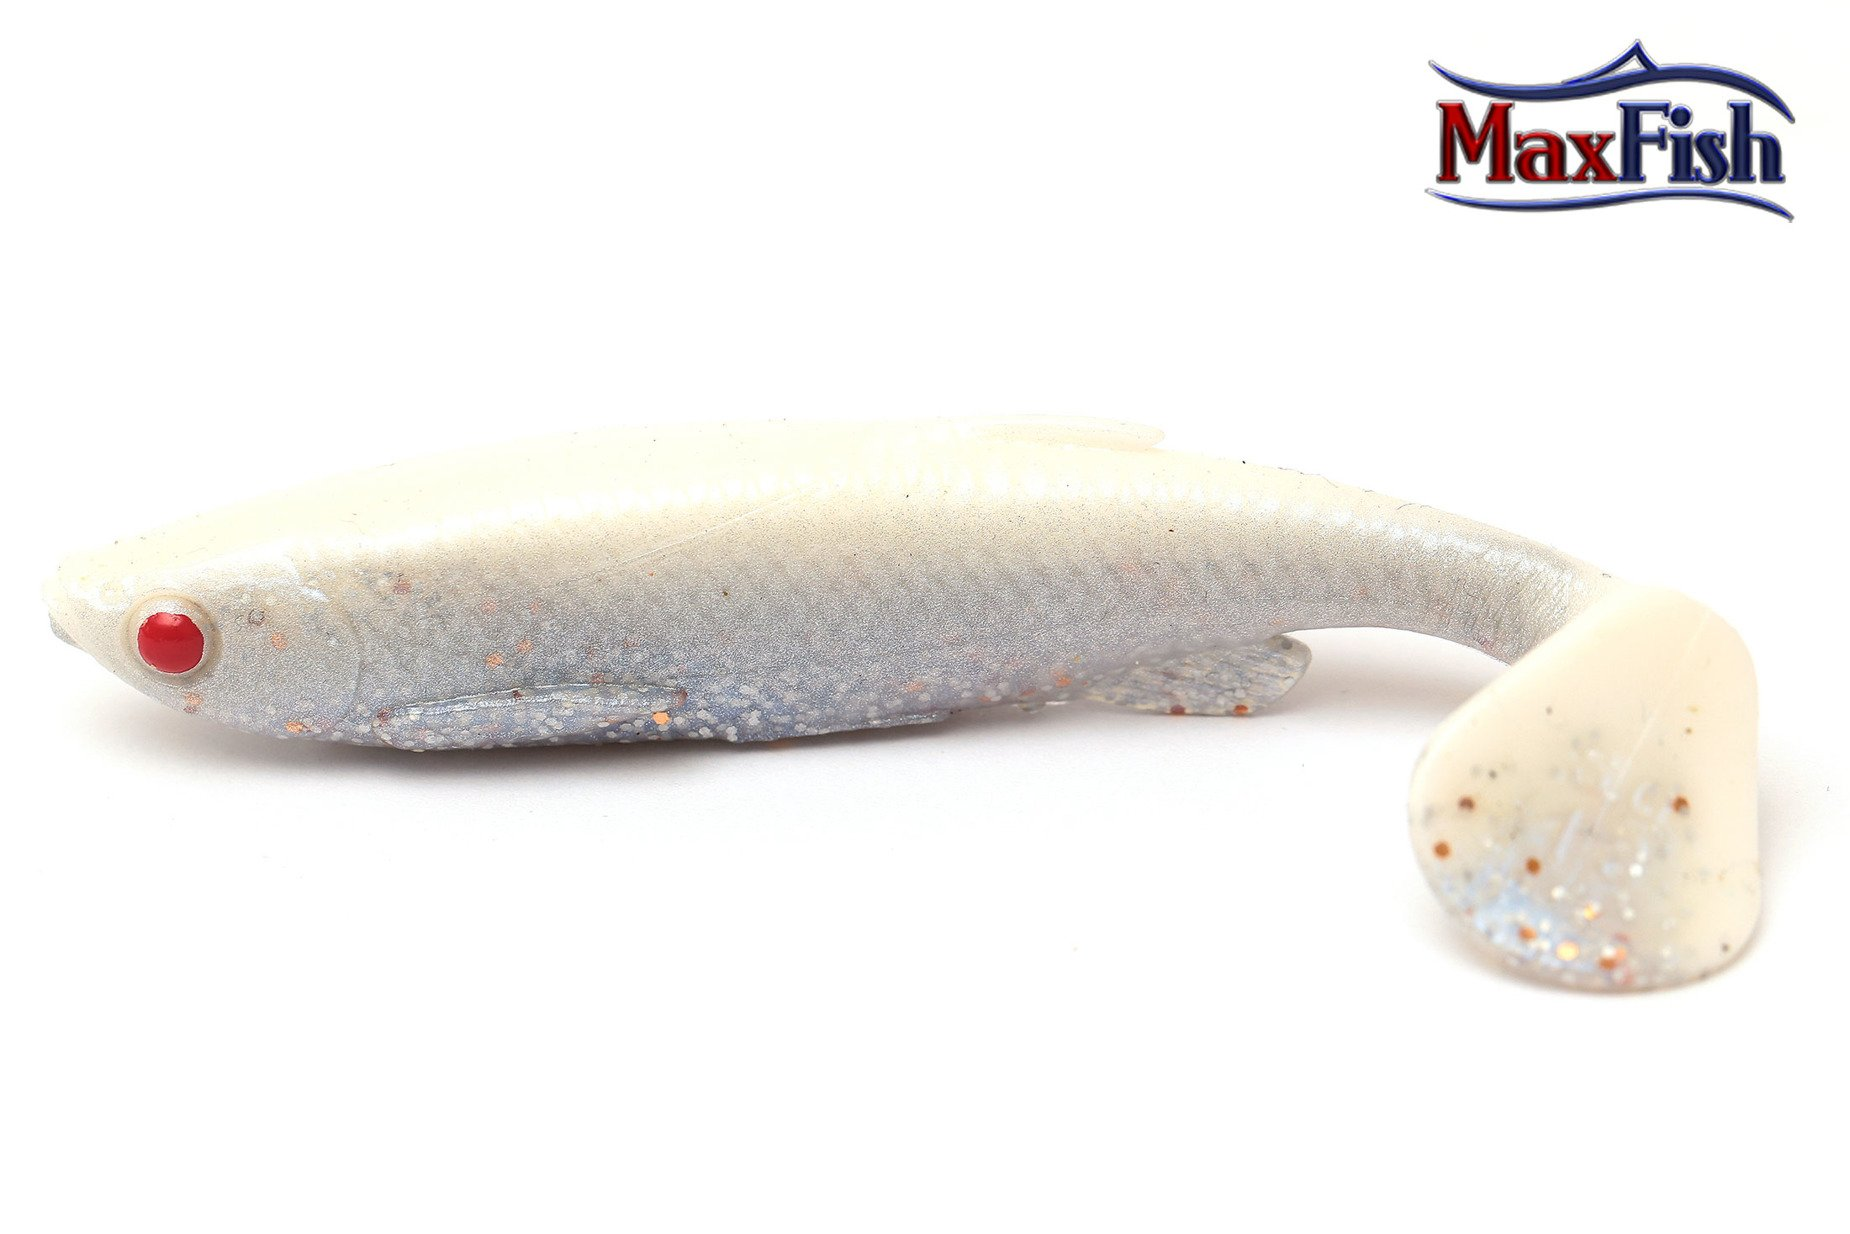 Savage Gear Fat-tail Minnow - White Silver 7.5cm 5g